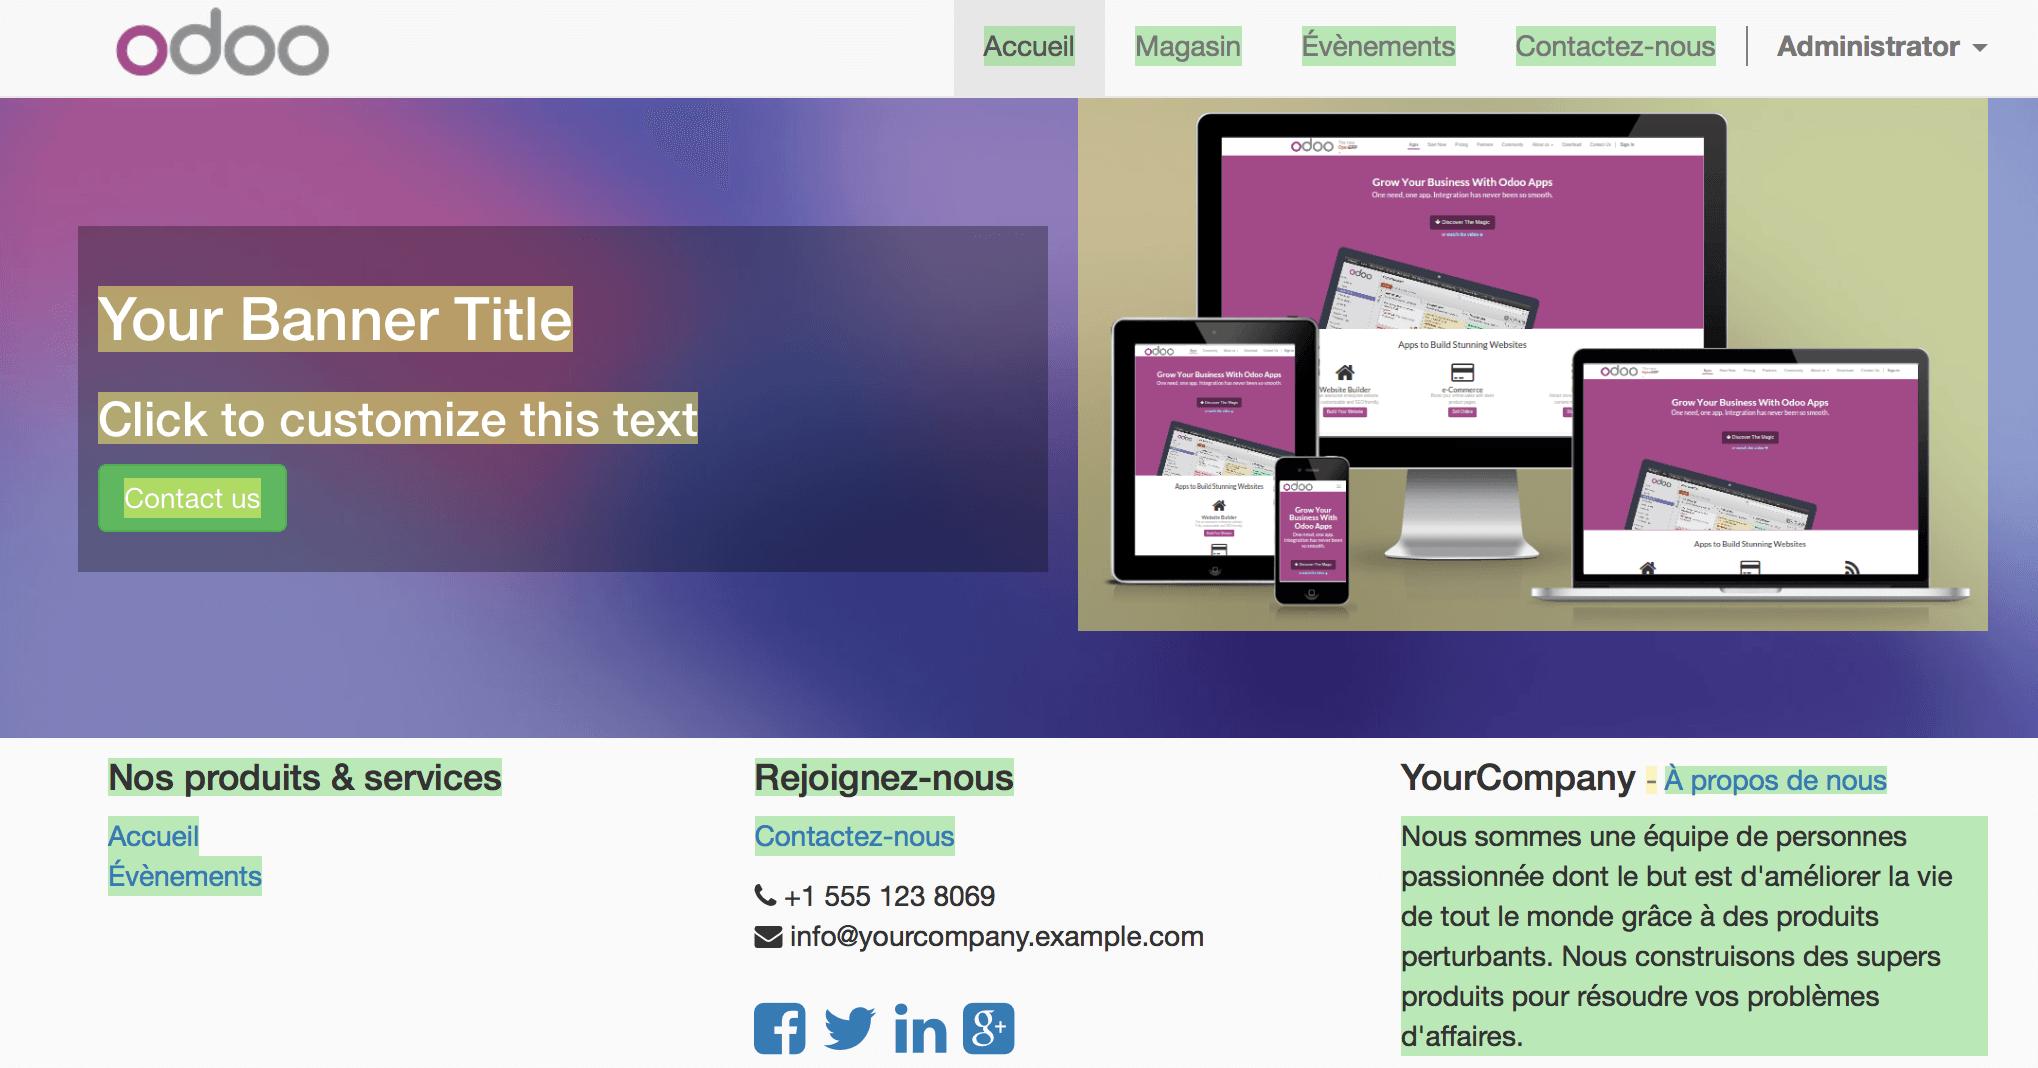 How to translate my website — Odoo 10 0 documentation